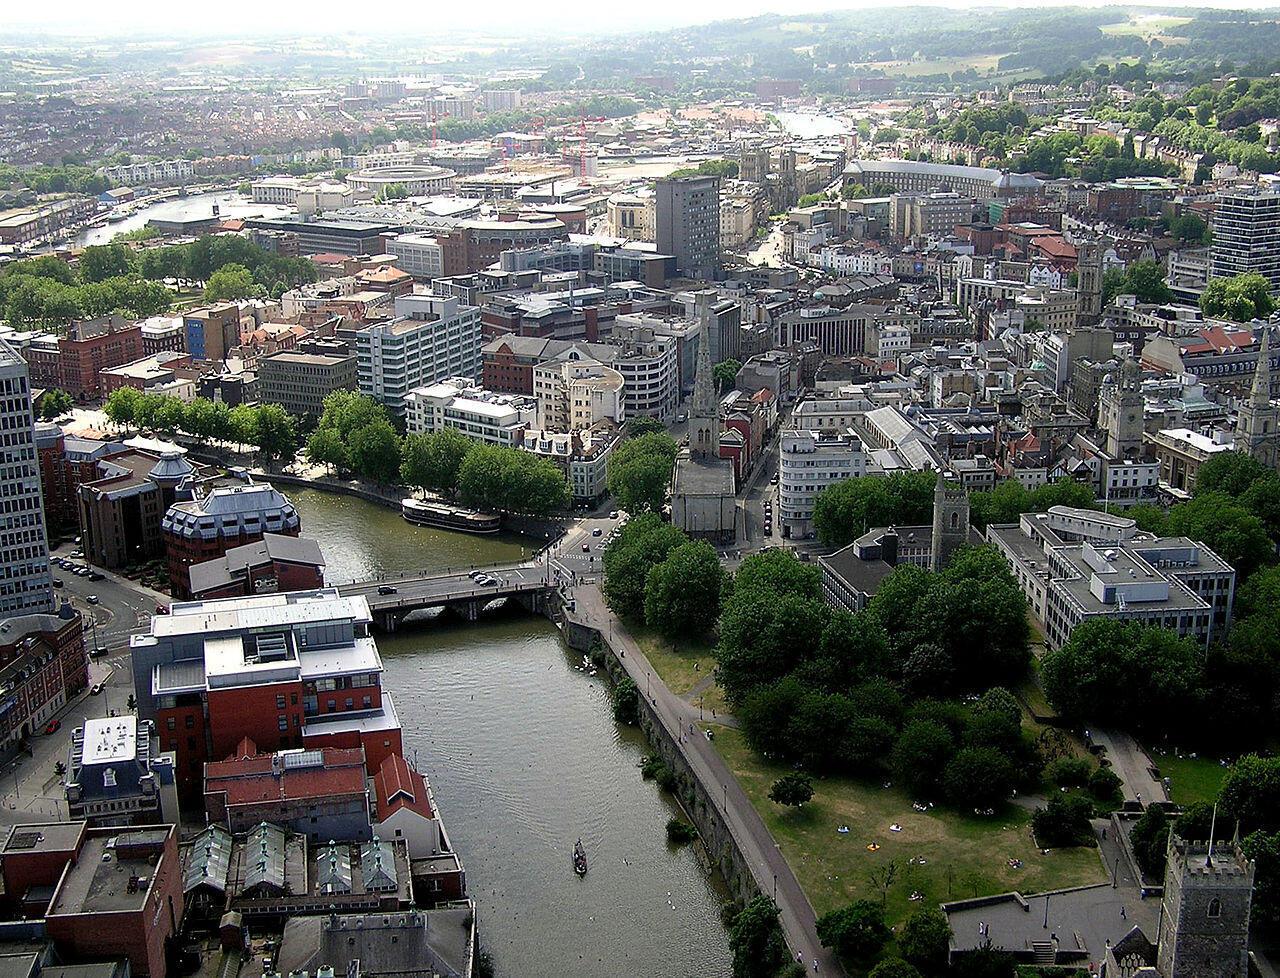 The River Avon flows through the centre of Bristol.